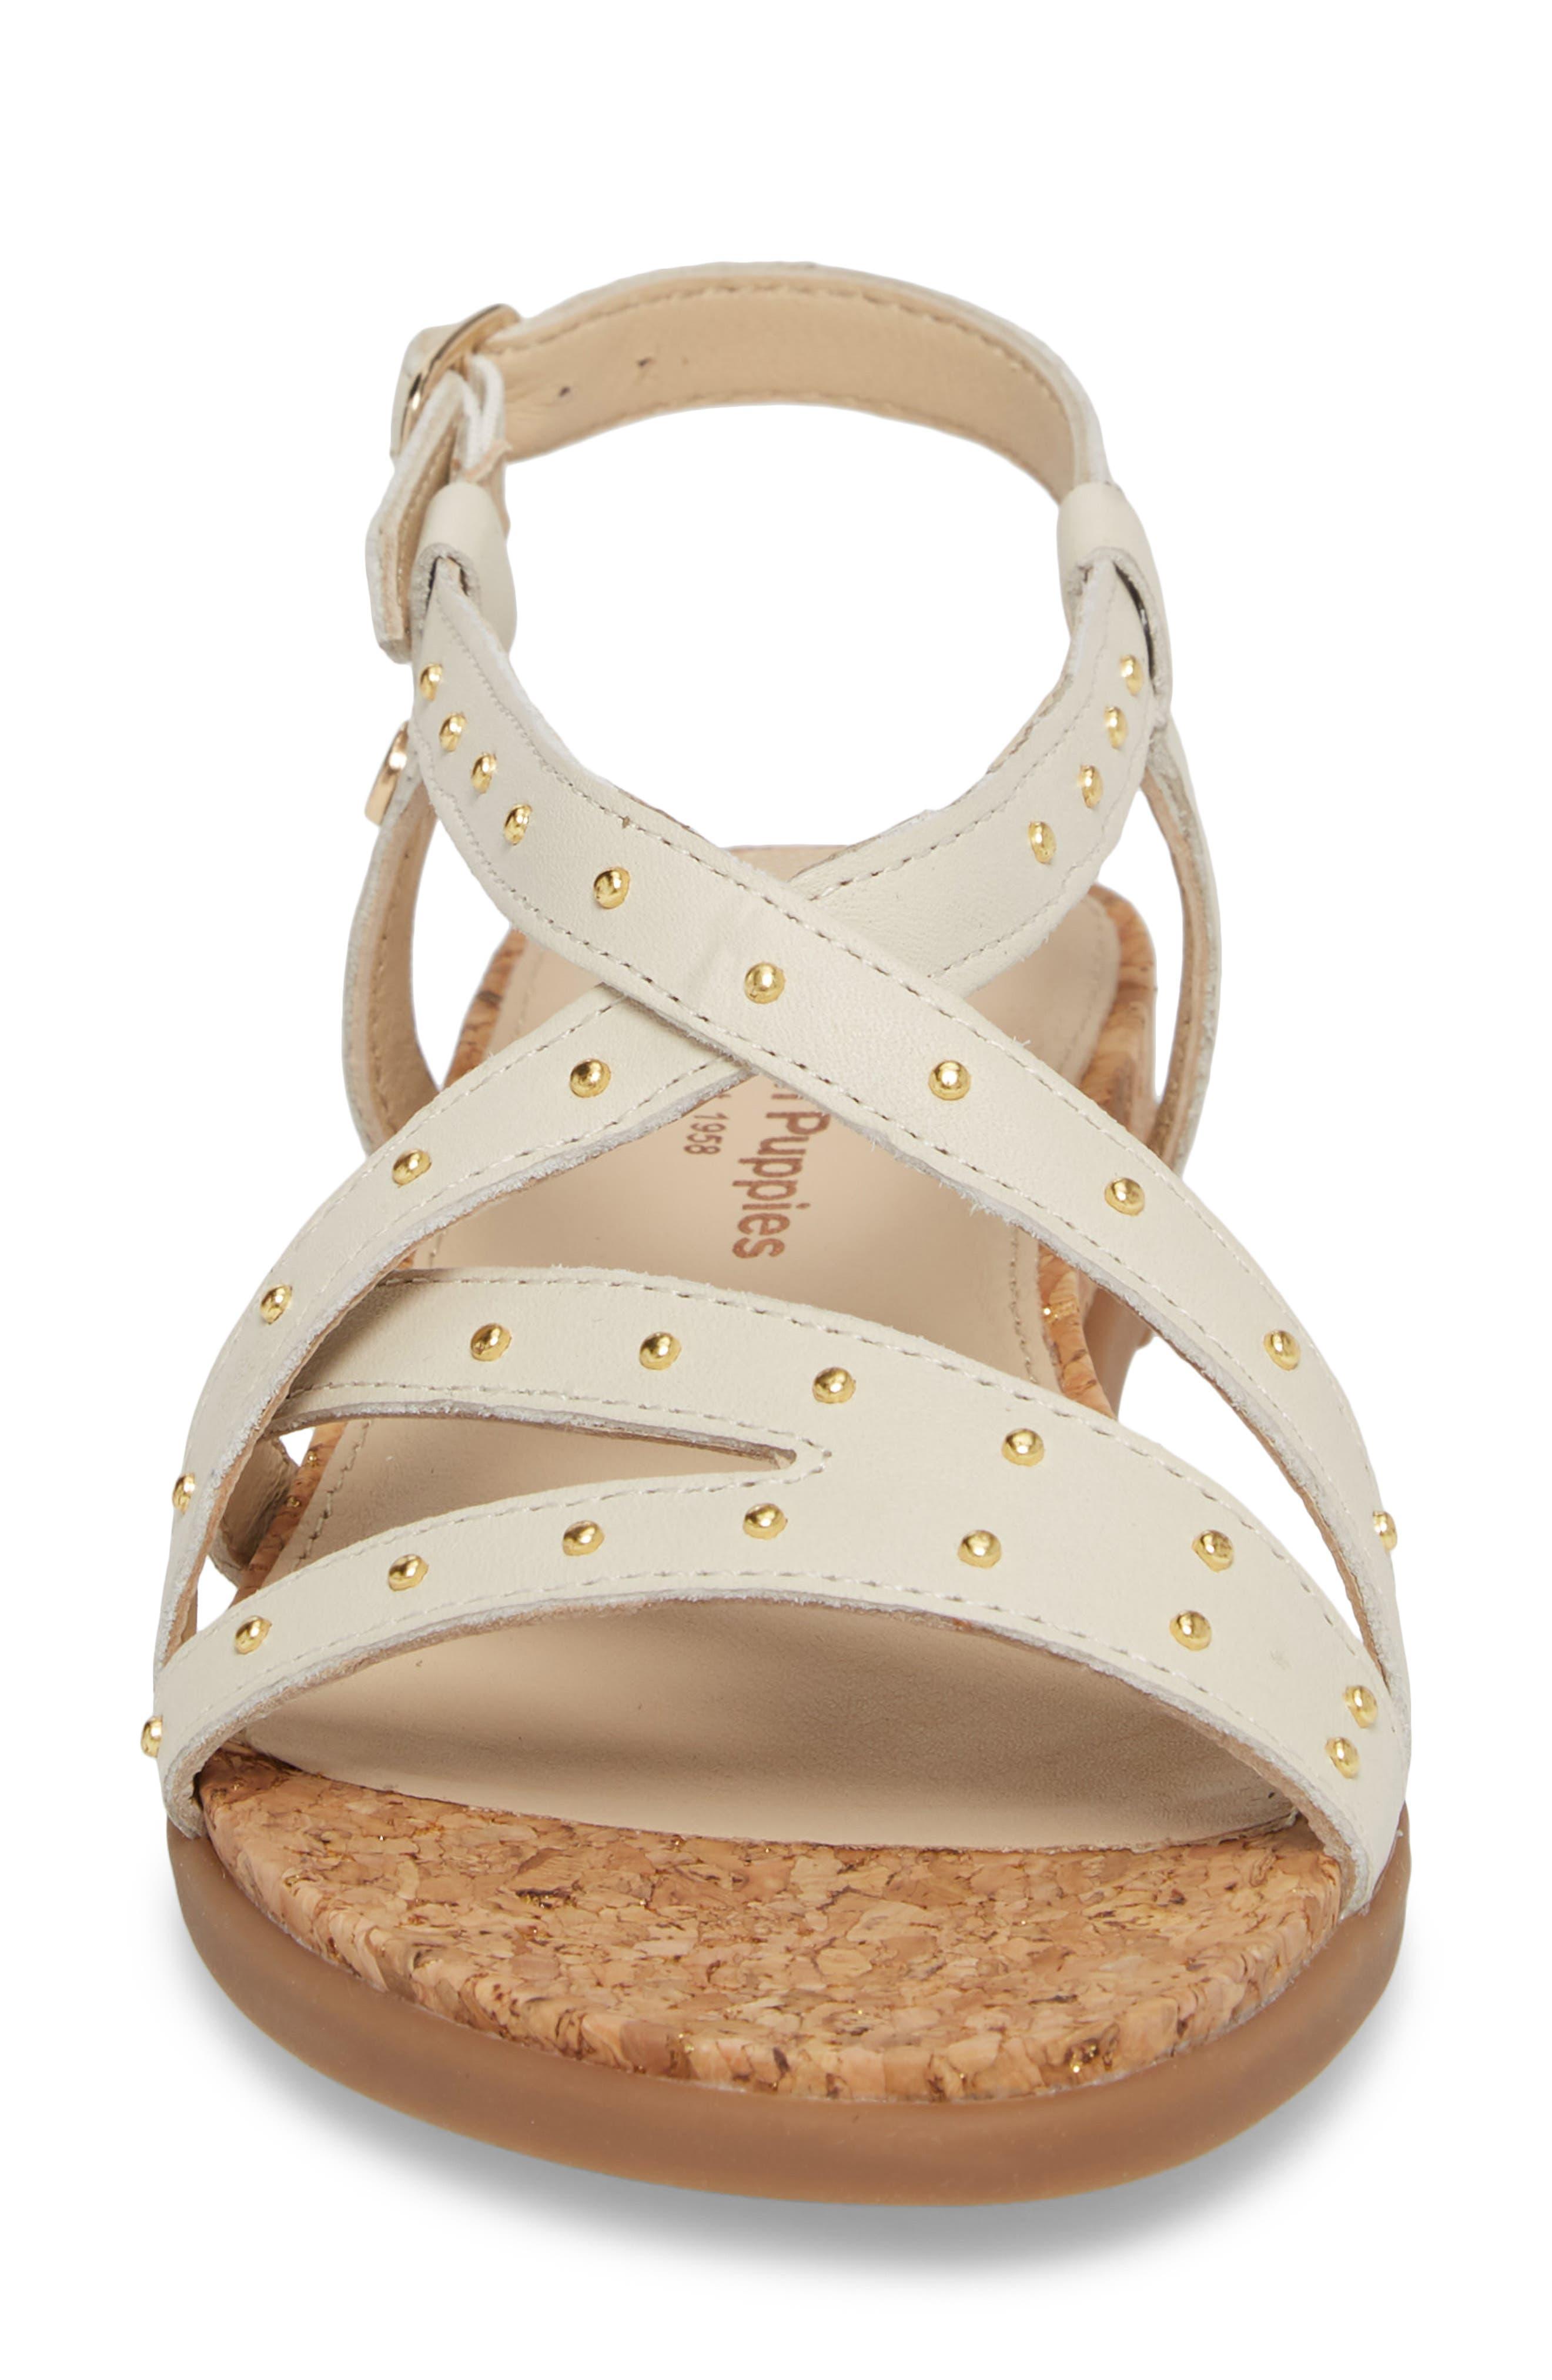 Dalmatian Studded Sandal,                             Alternate thumbnail 4, color,                             Ivory Leather